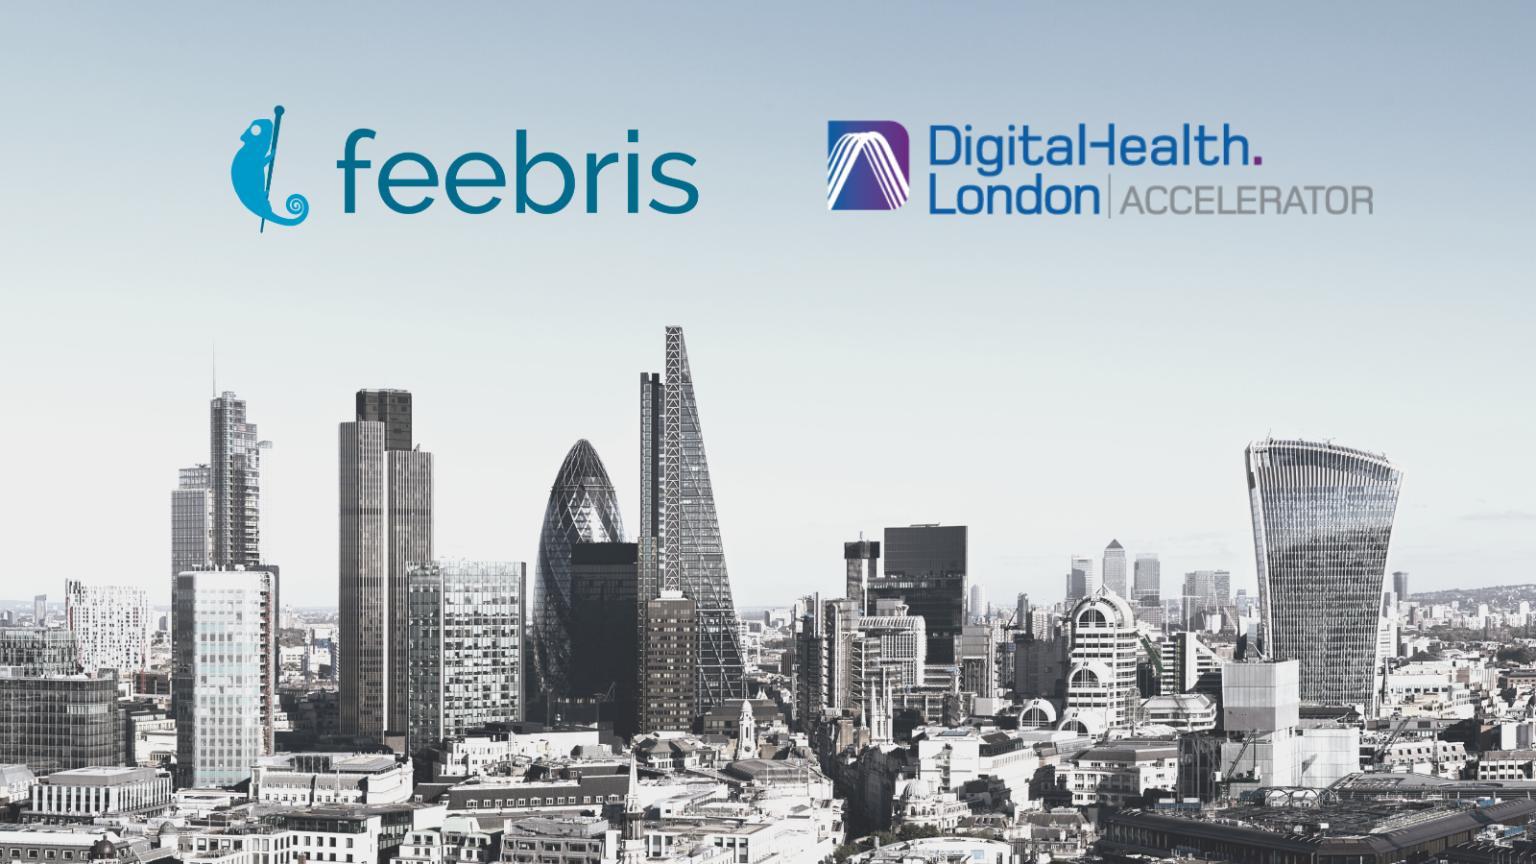 Scaling our NHS reach through the DigitalHealth.London Accelerator